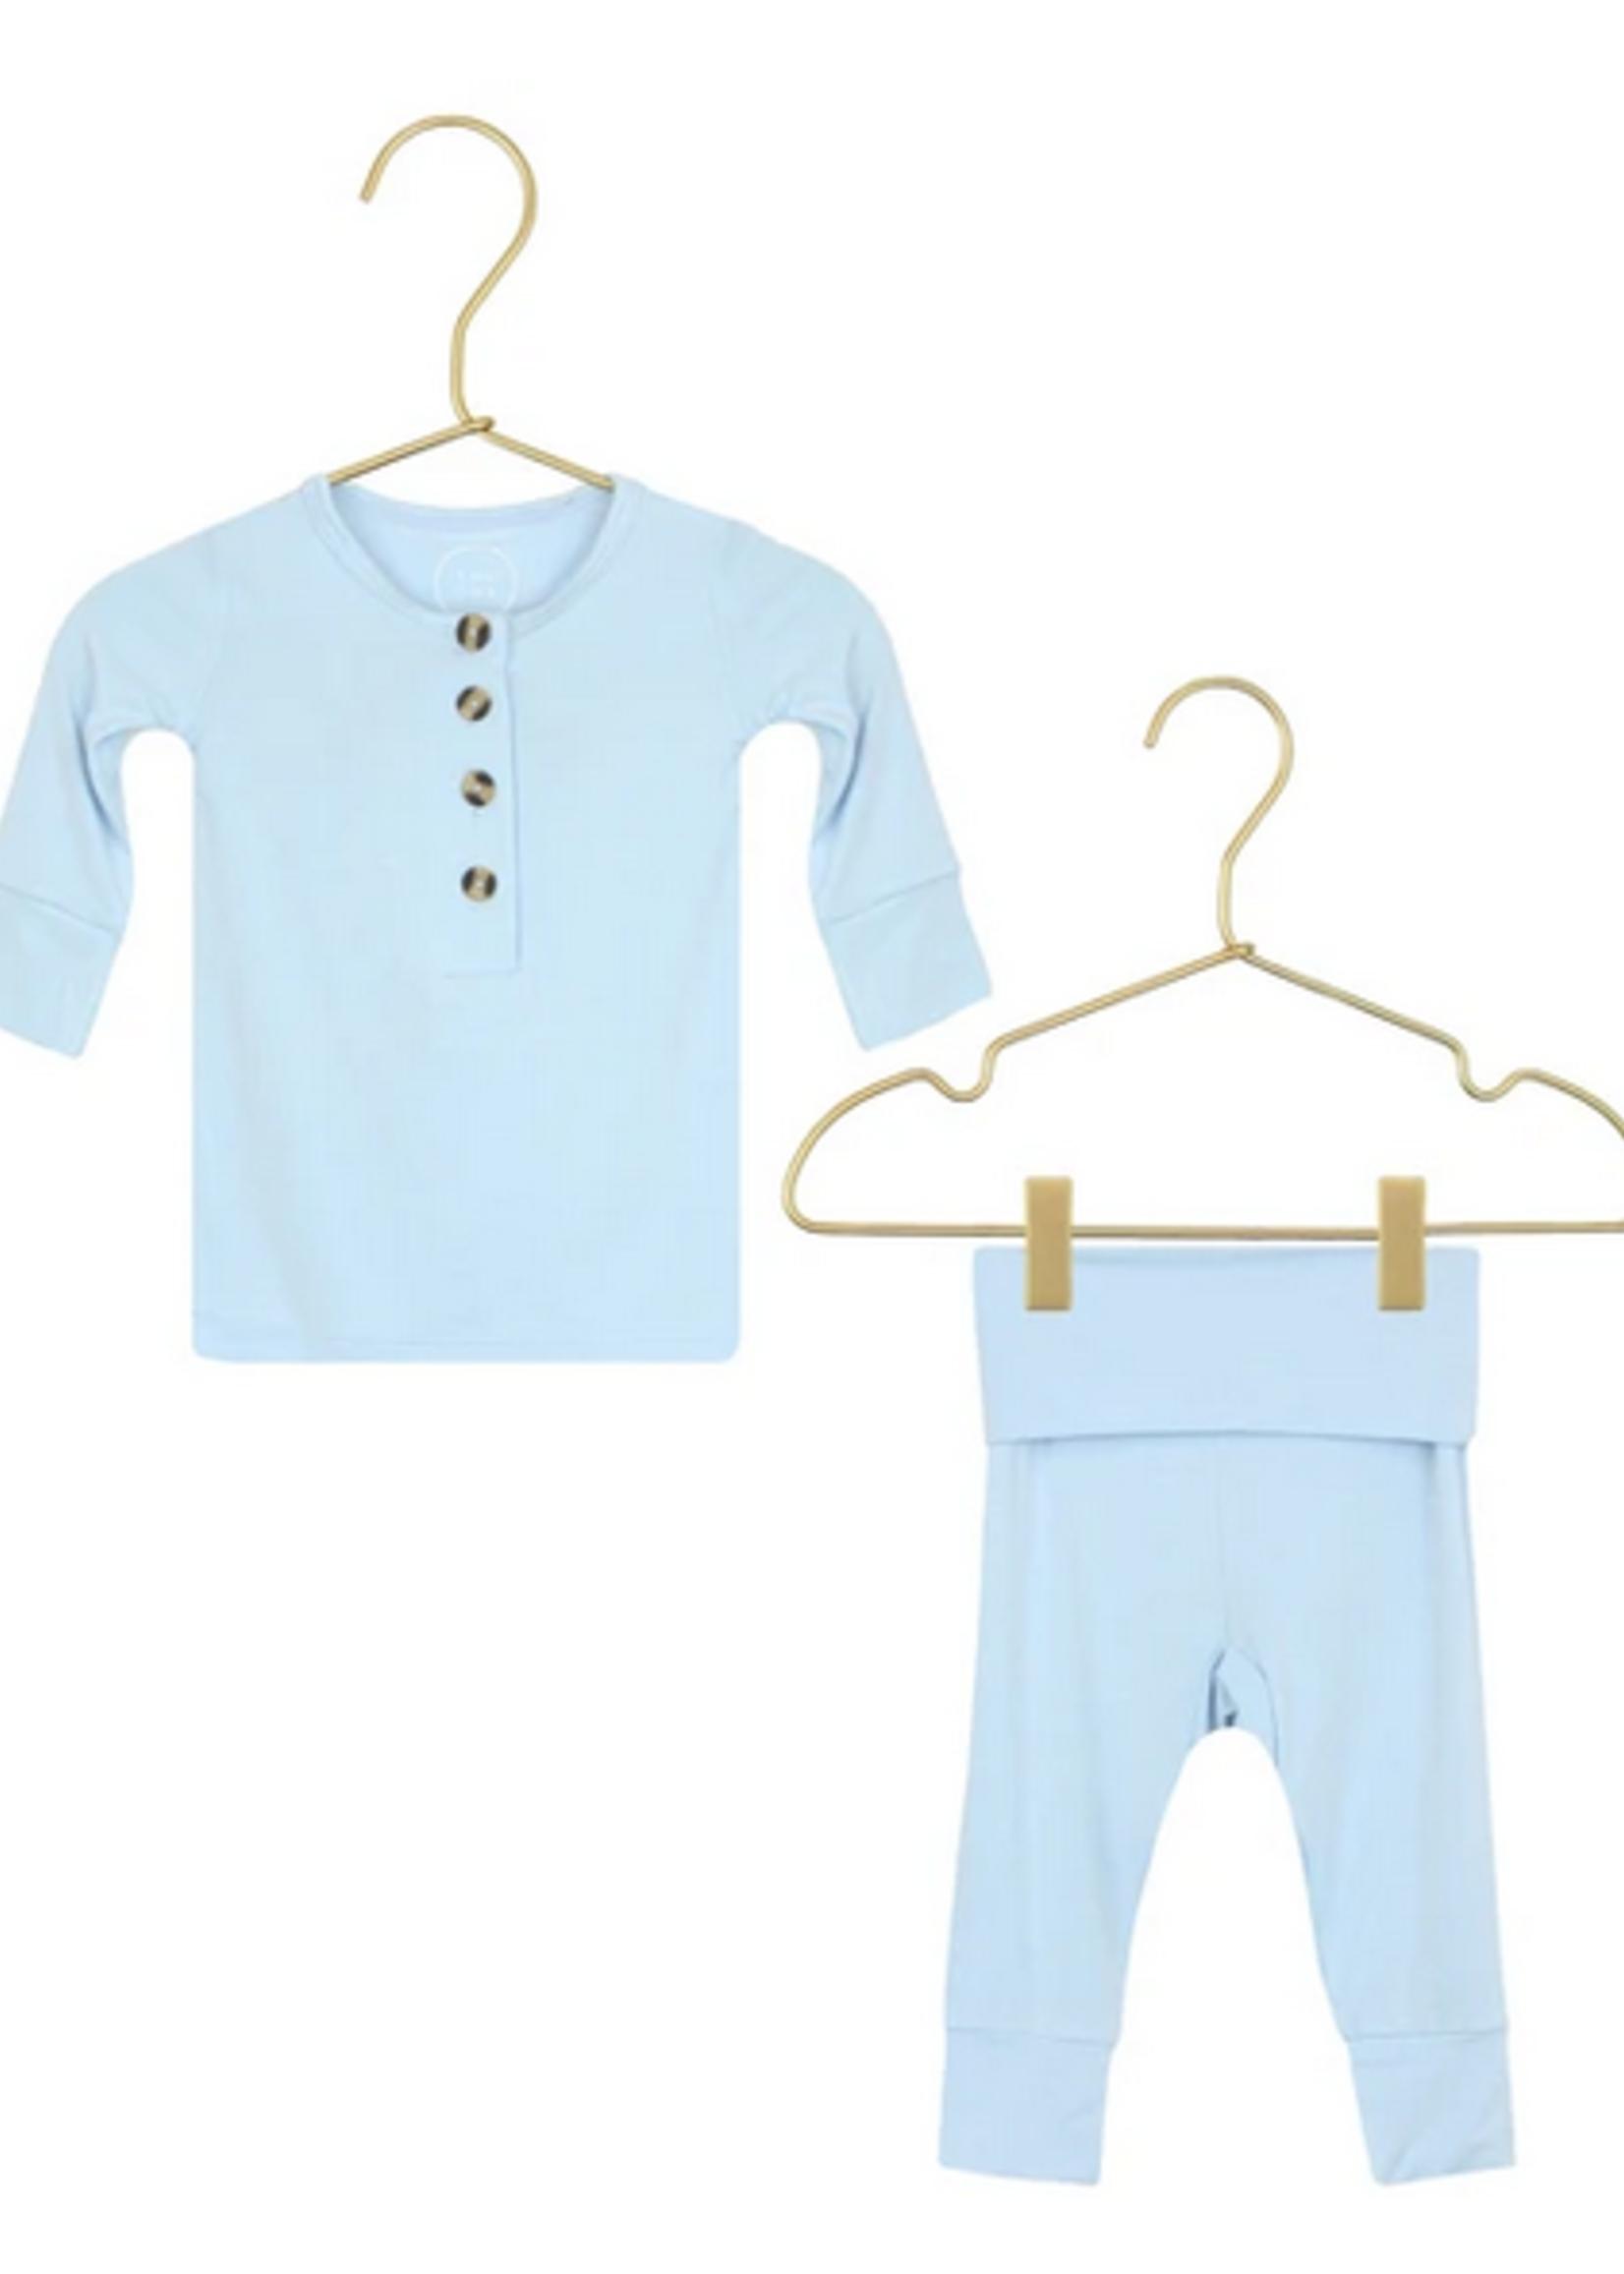 Elitaire Petite Jude Baby Blue Set 6-12 Months